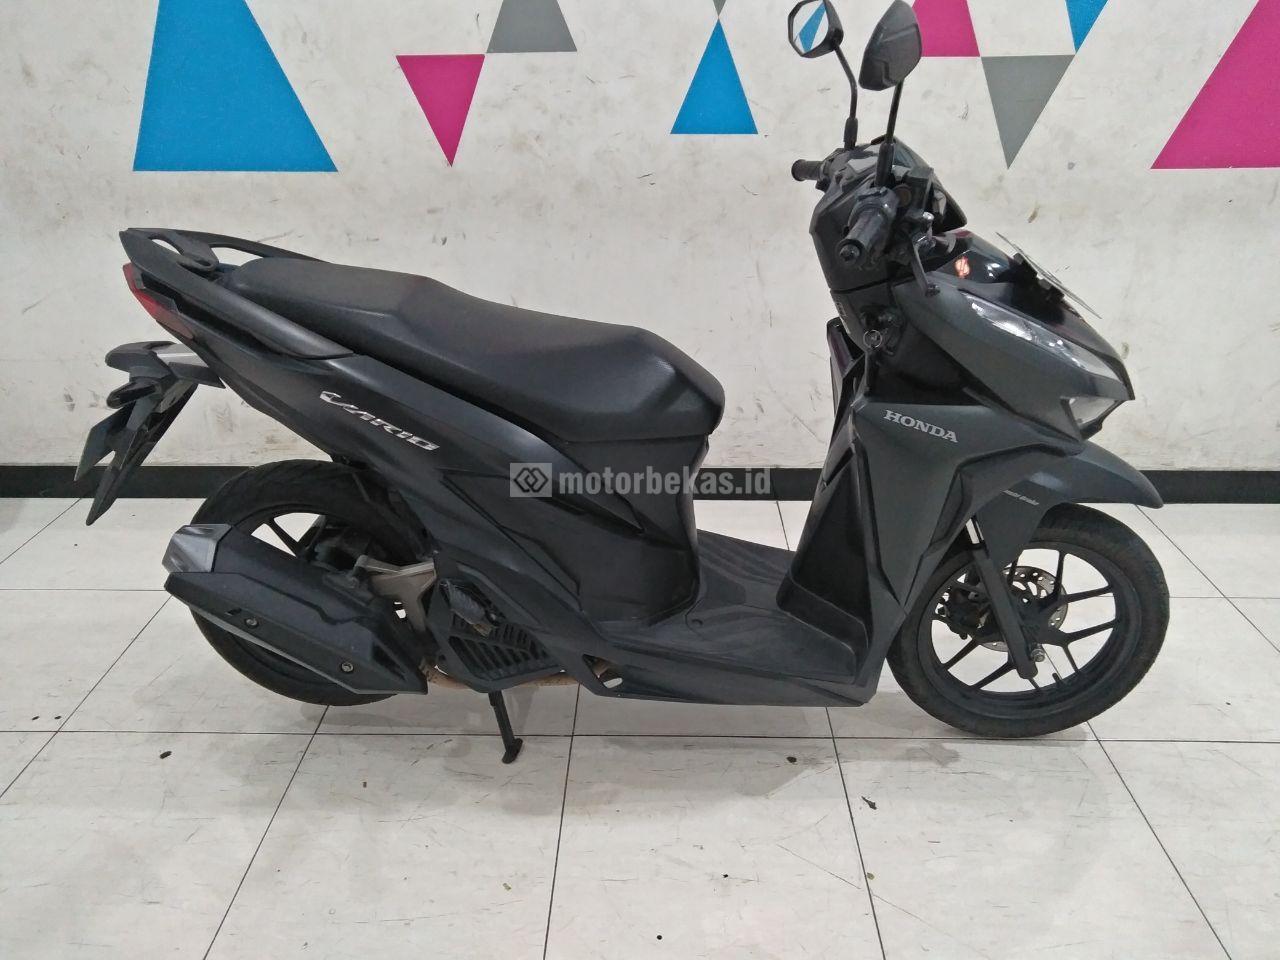 HONDA VARIO 125  3290 motorbekas.id